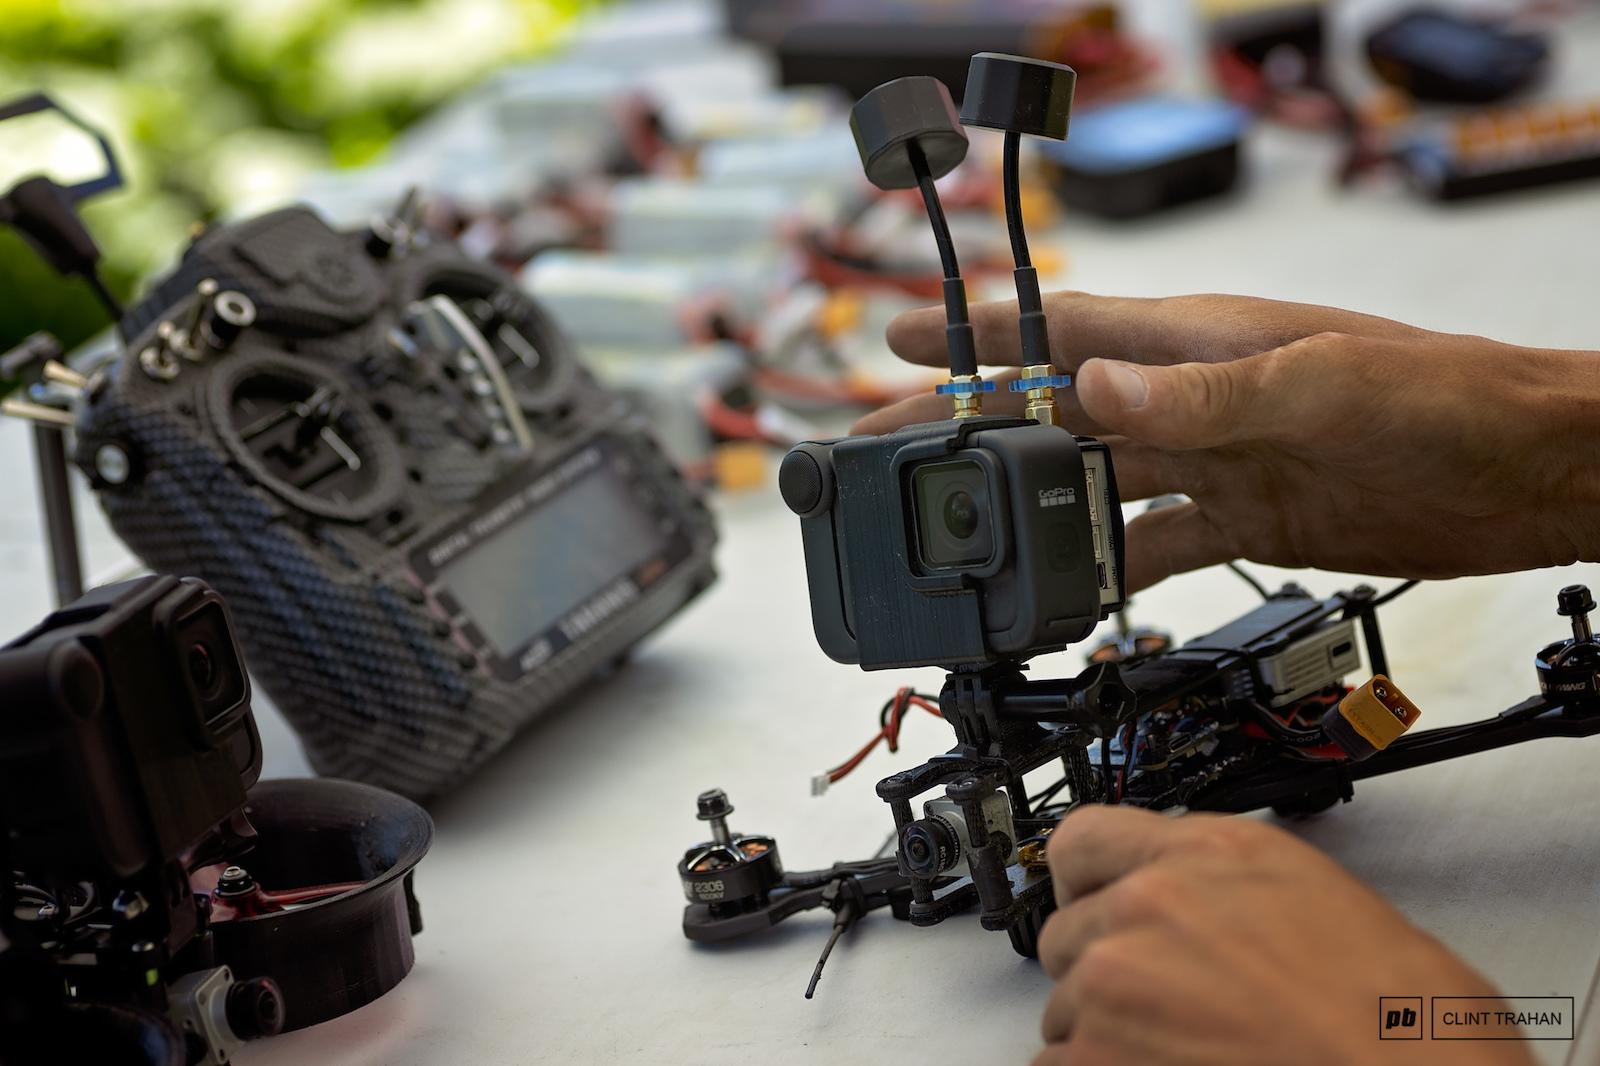 FPV Drones FTW.